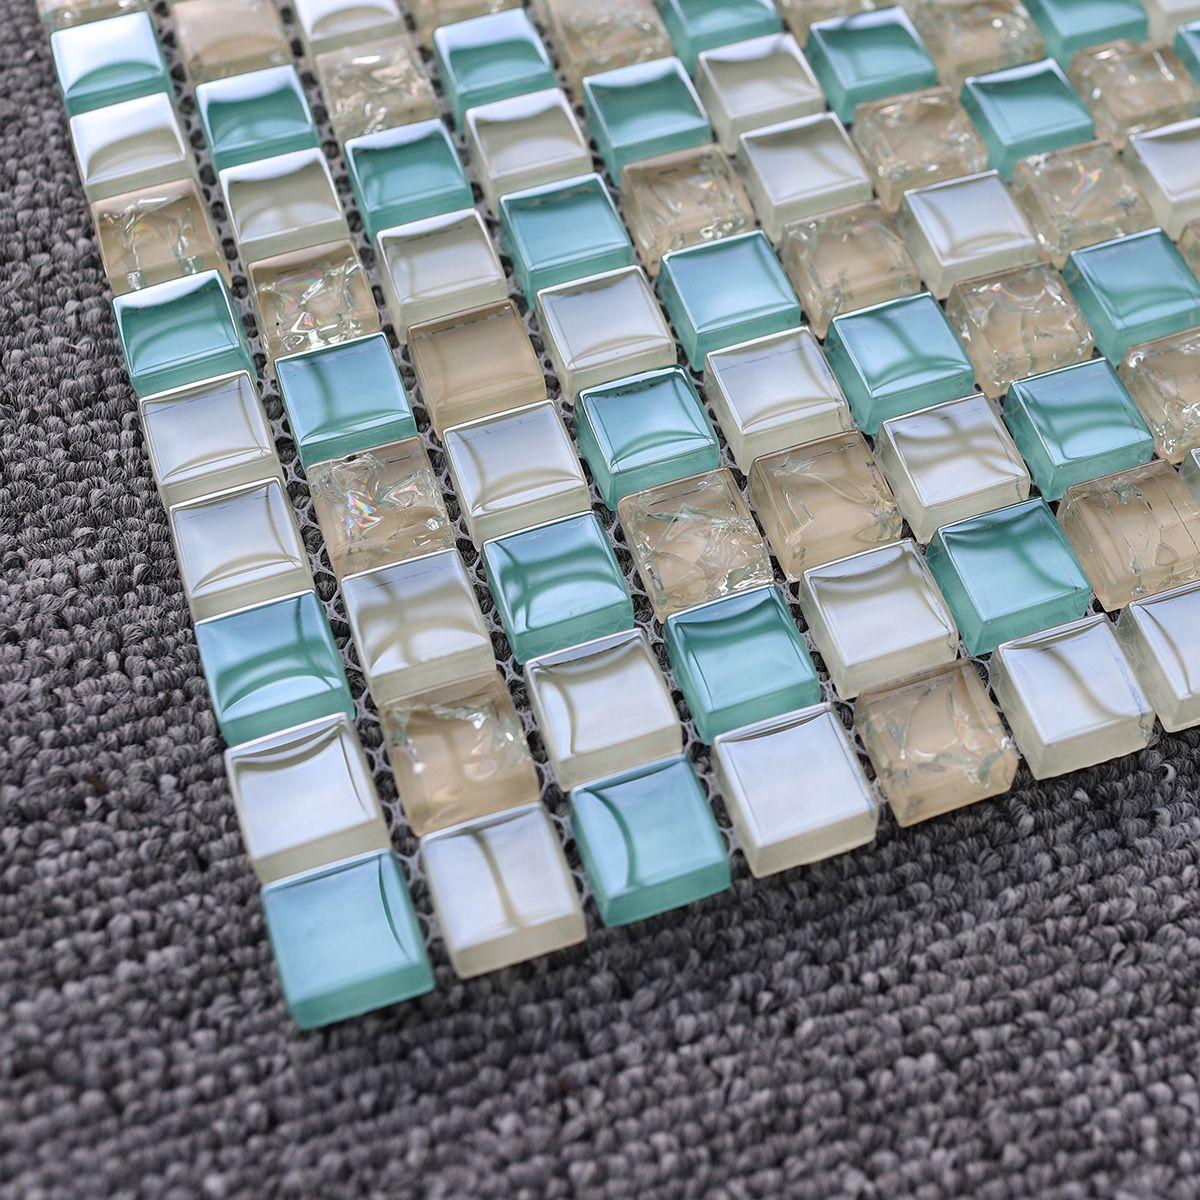 2021 Blue Beige Crackle Glass Mosaic Wall Tile Kitchen Backsplash Jmfgt082 15x15mm Crystal Glass Mosaic Bathroom Wall Tiles From Sophie Charm 15 87 Dhgate Com